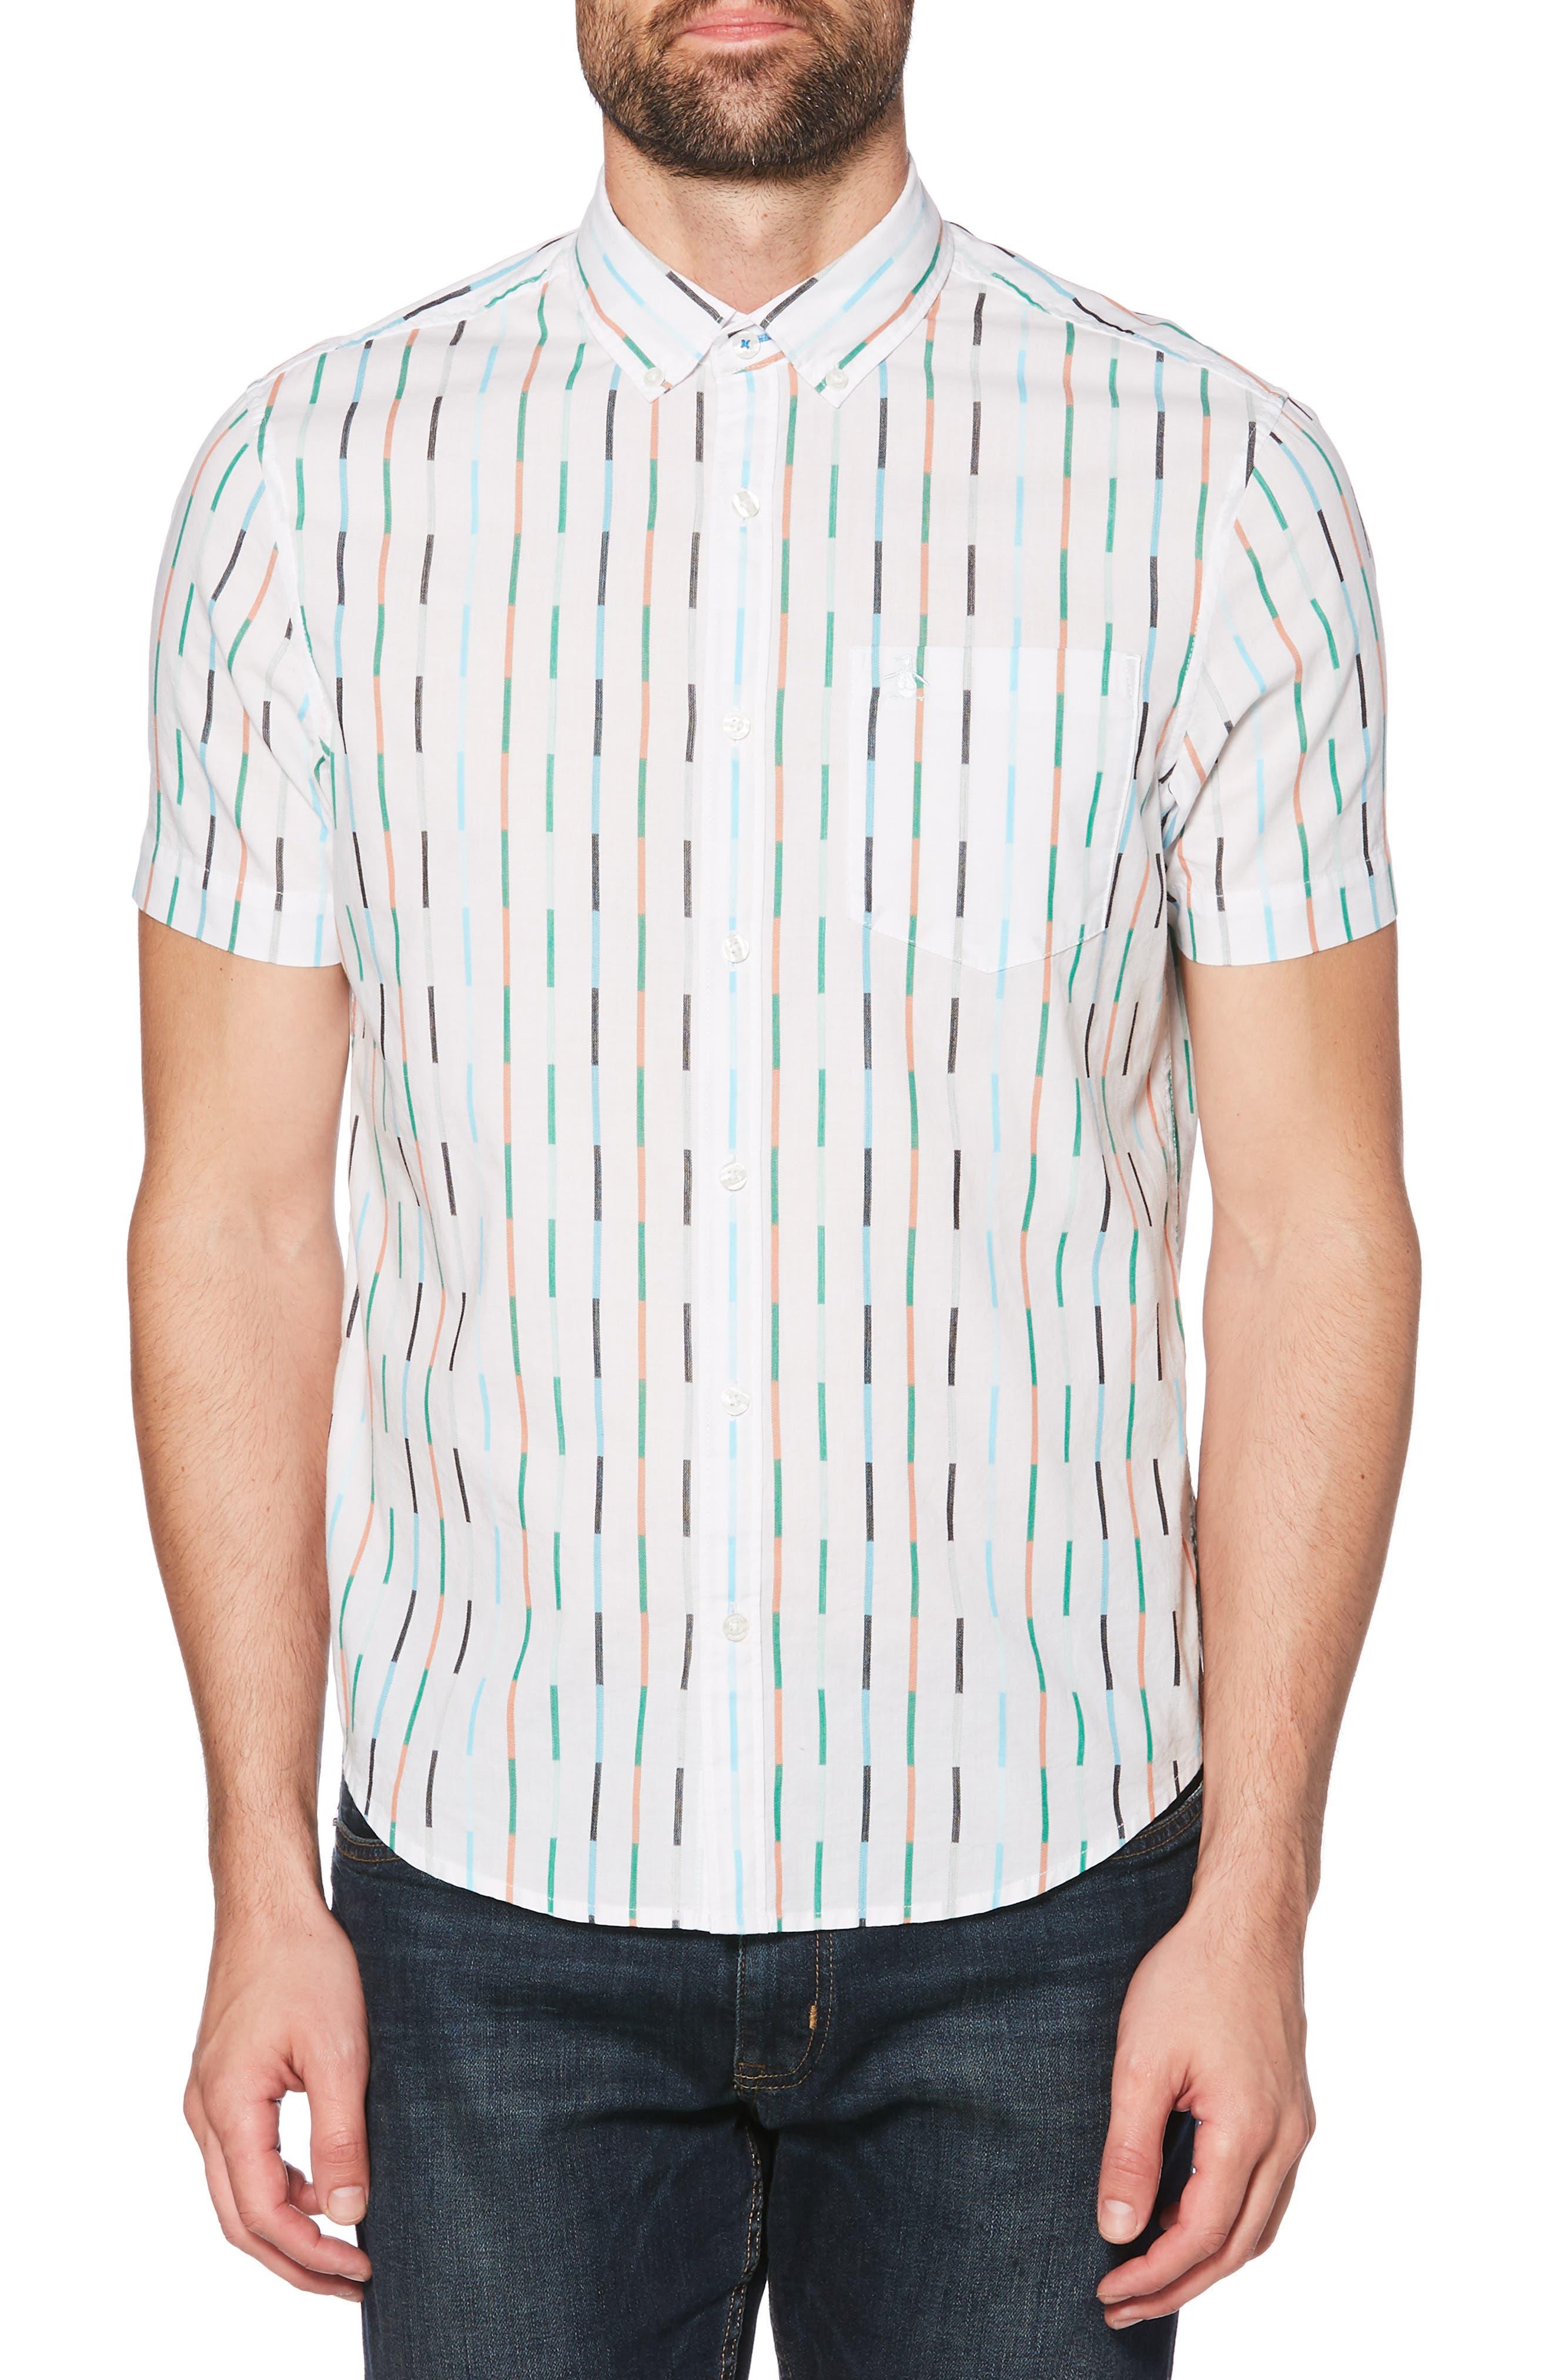 ORIGINAL PENGUIN Vertical Broken Stripe Woven Shirt, Main, color, BRIGHT WHITE